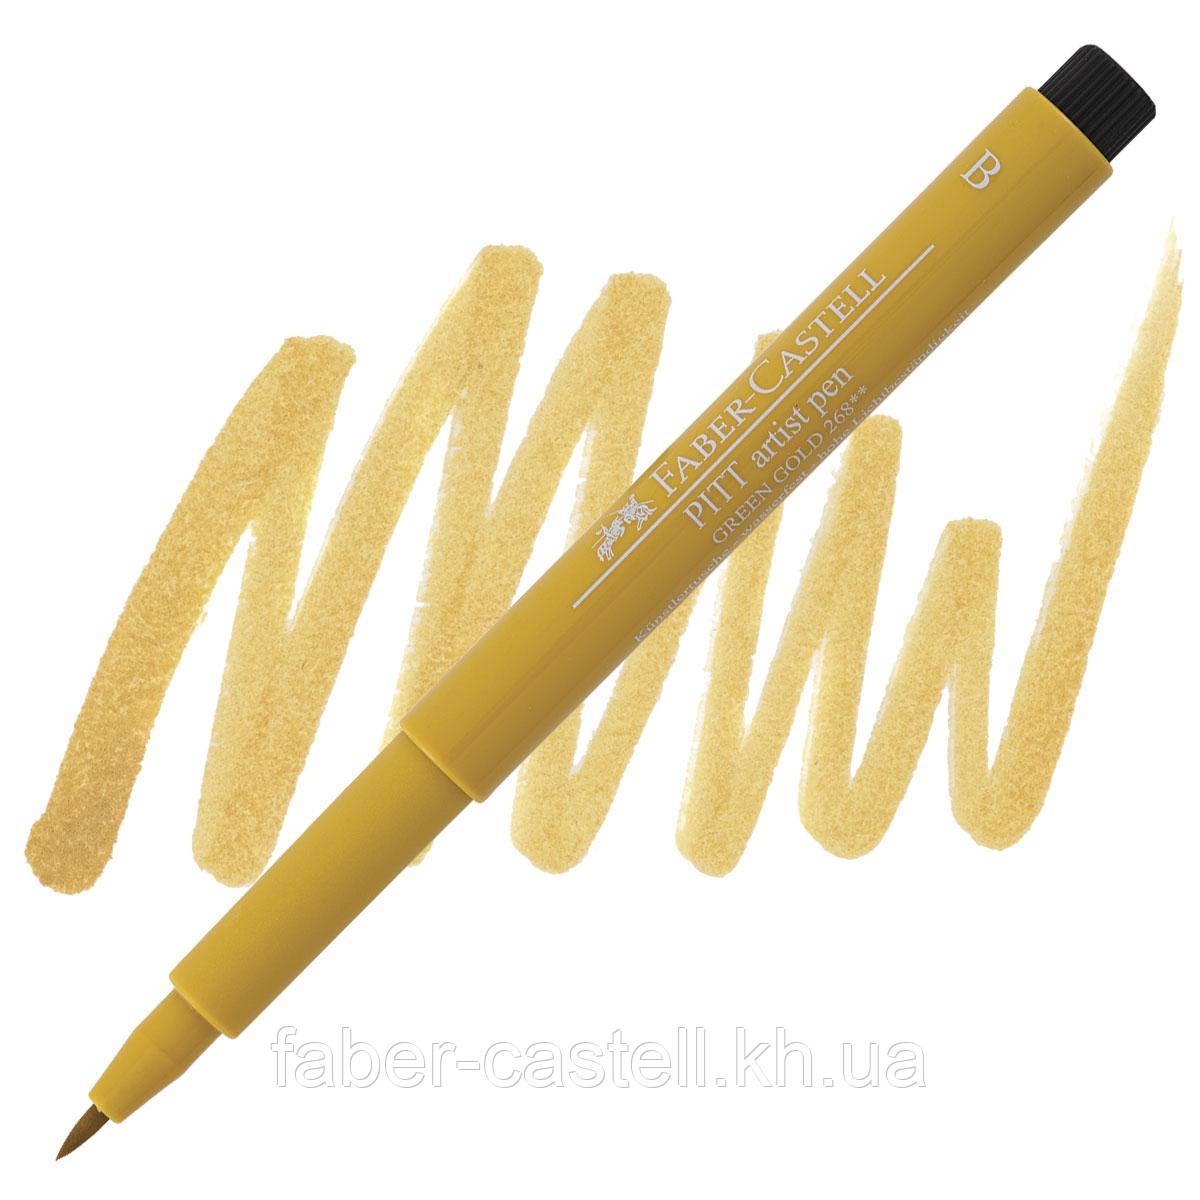 "Ручка-кисточка капиллярная Faber - Castell PITT® ARTIST PEN ""BRUSH"" №268 зеленое золото, 167468"